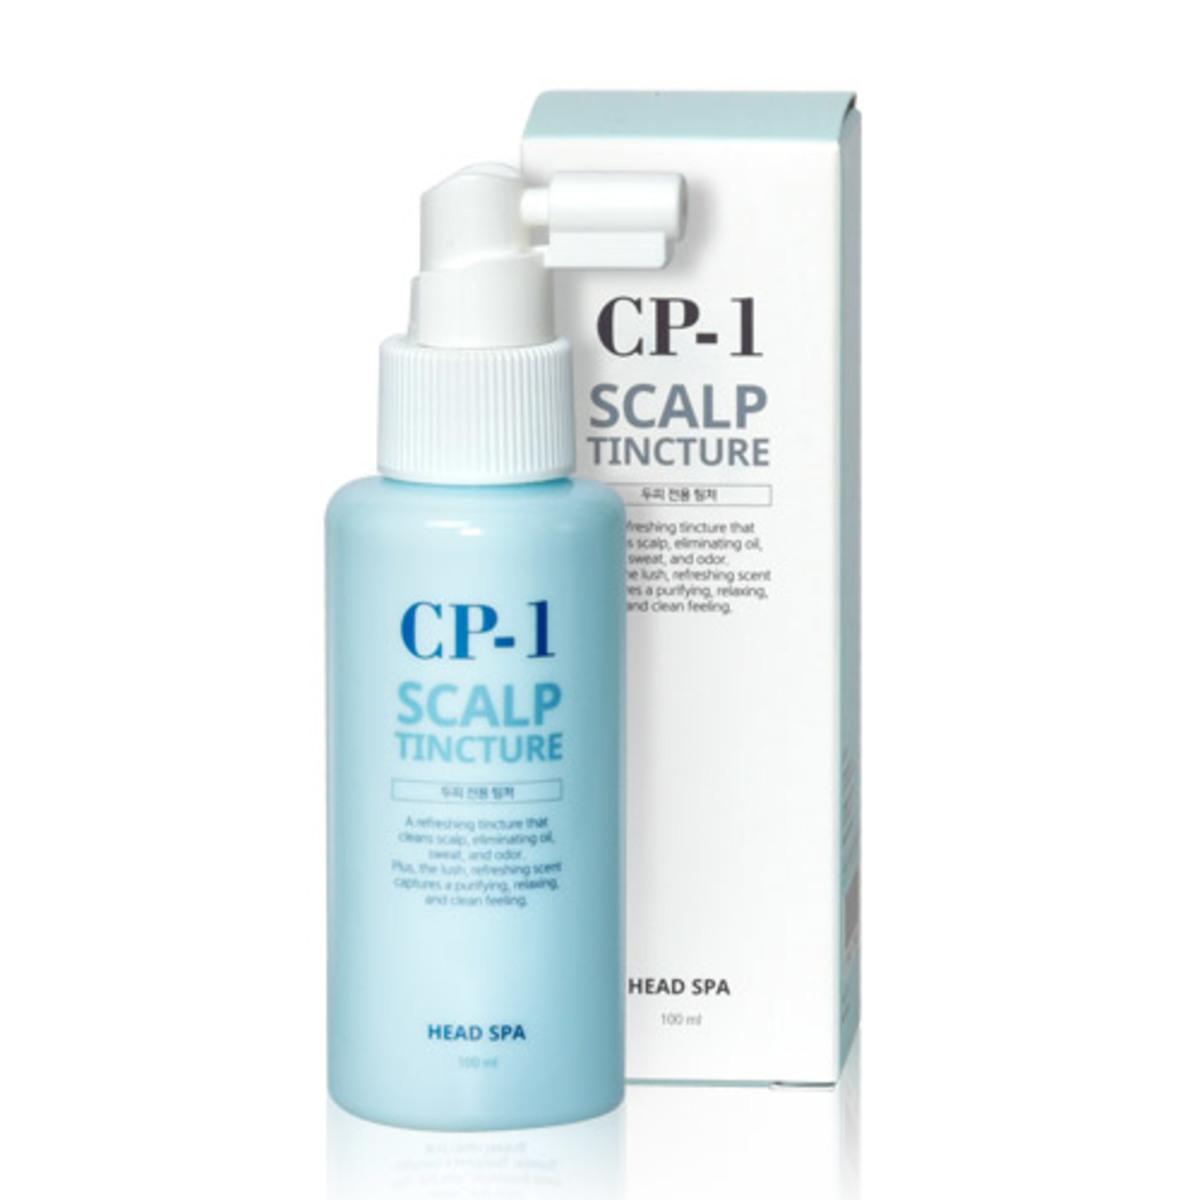 CP-1 Premium Head Spa Scalp Tincture 頭皮去油清爽噴霧 100ml (一噴乾爽! 隨身攜帶!)